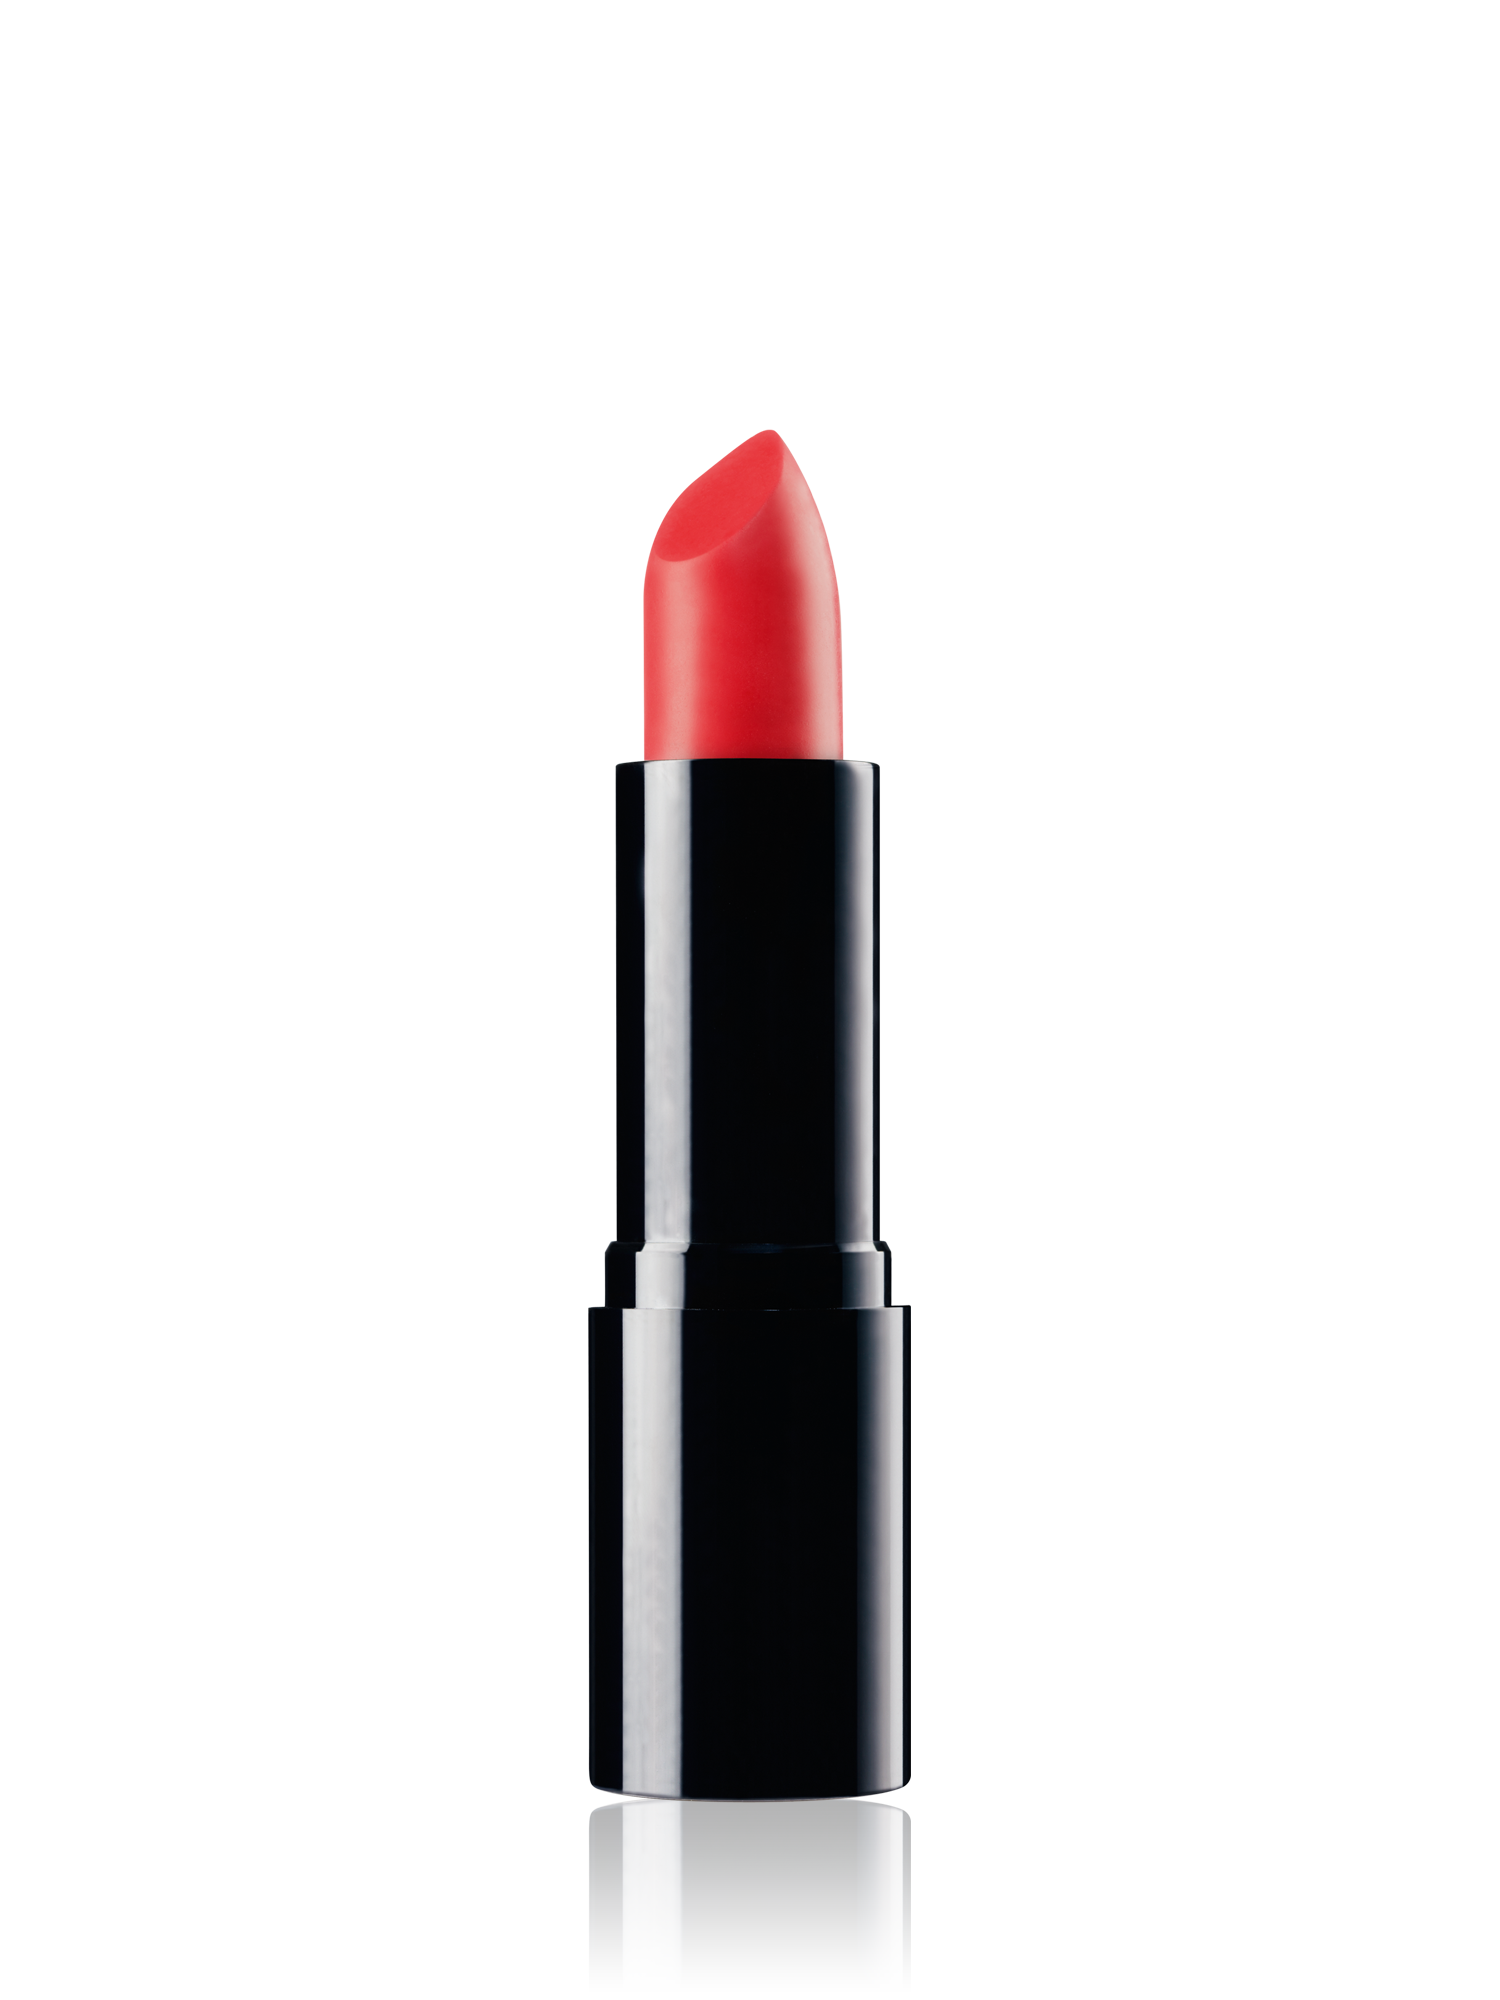 Lipstick PNG Images Transparent Free Download.